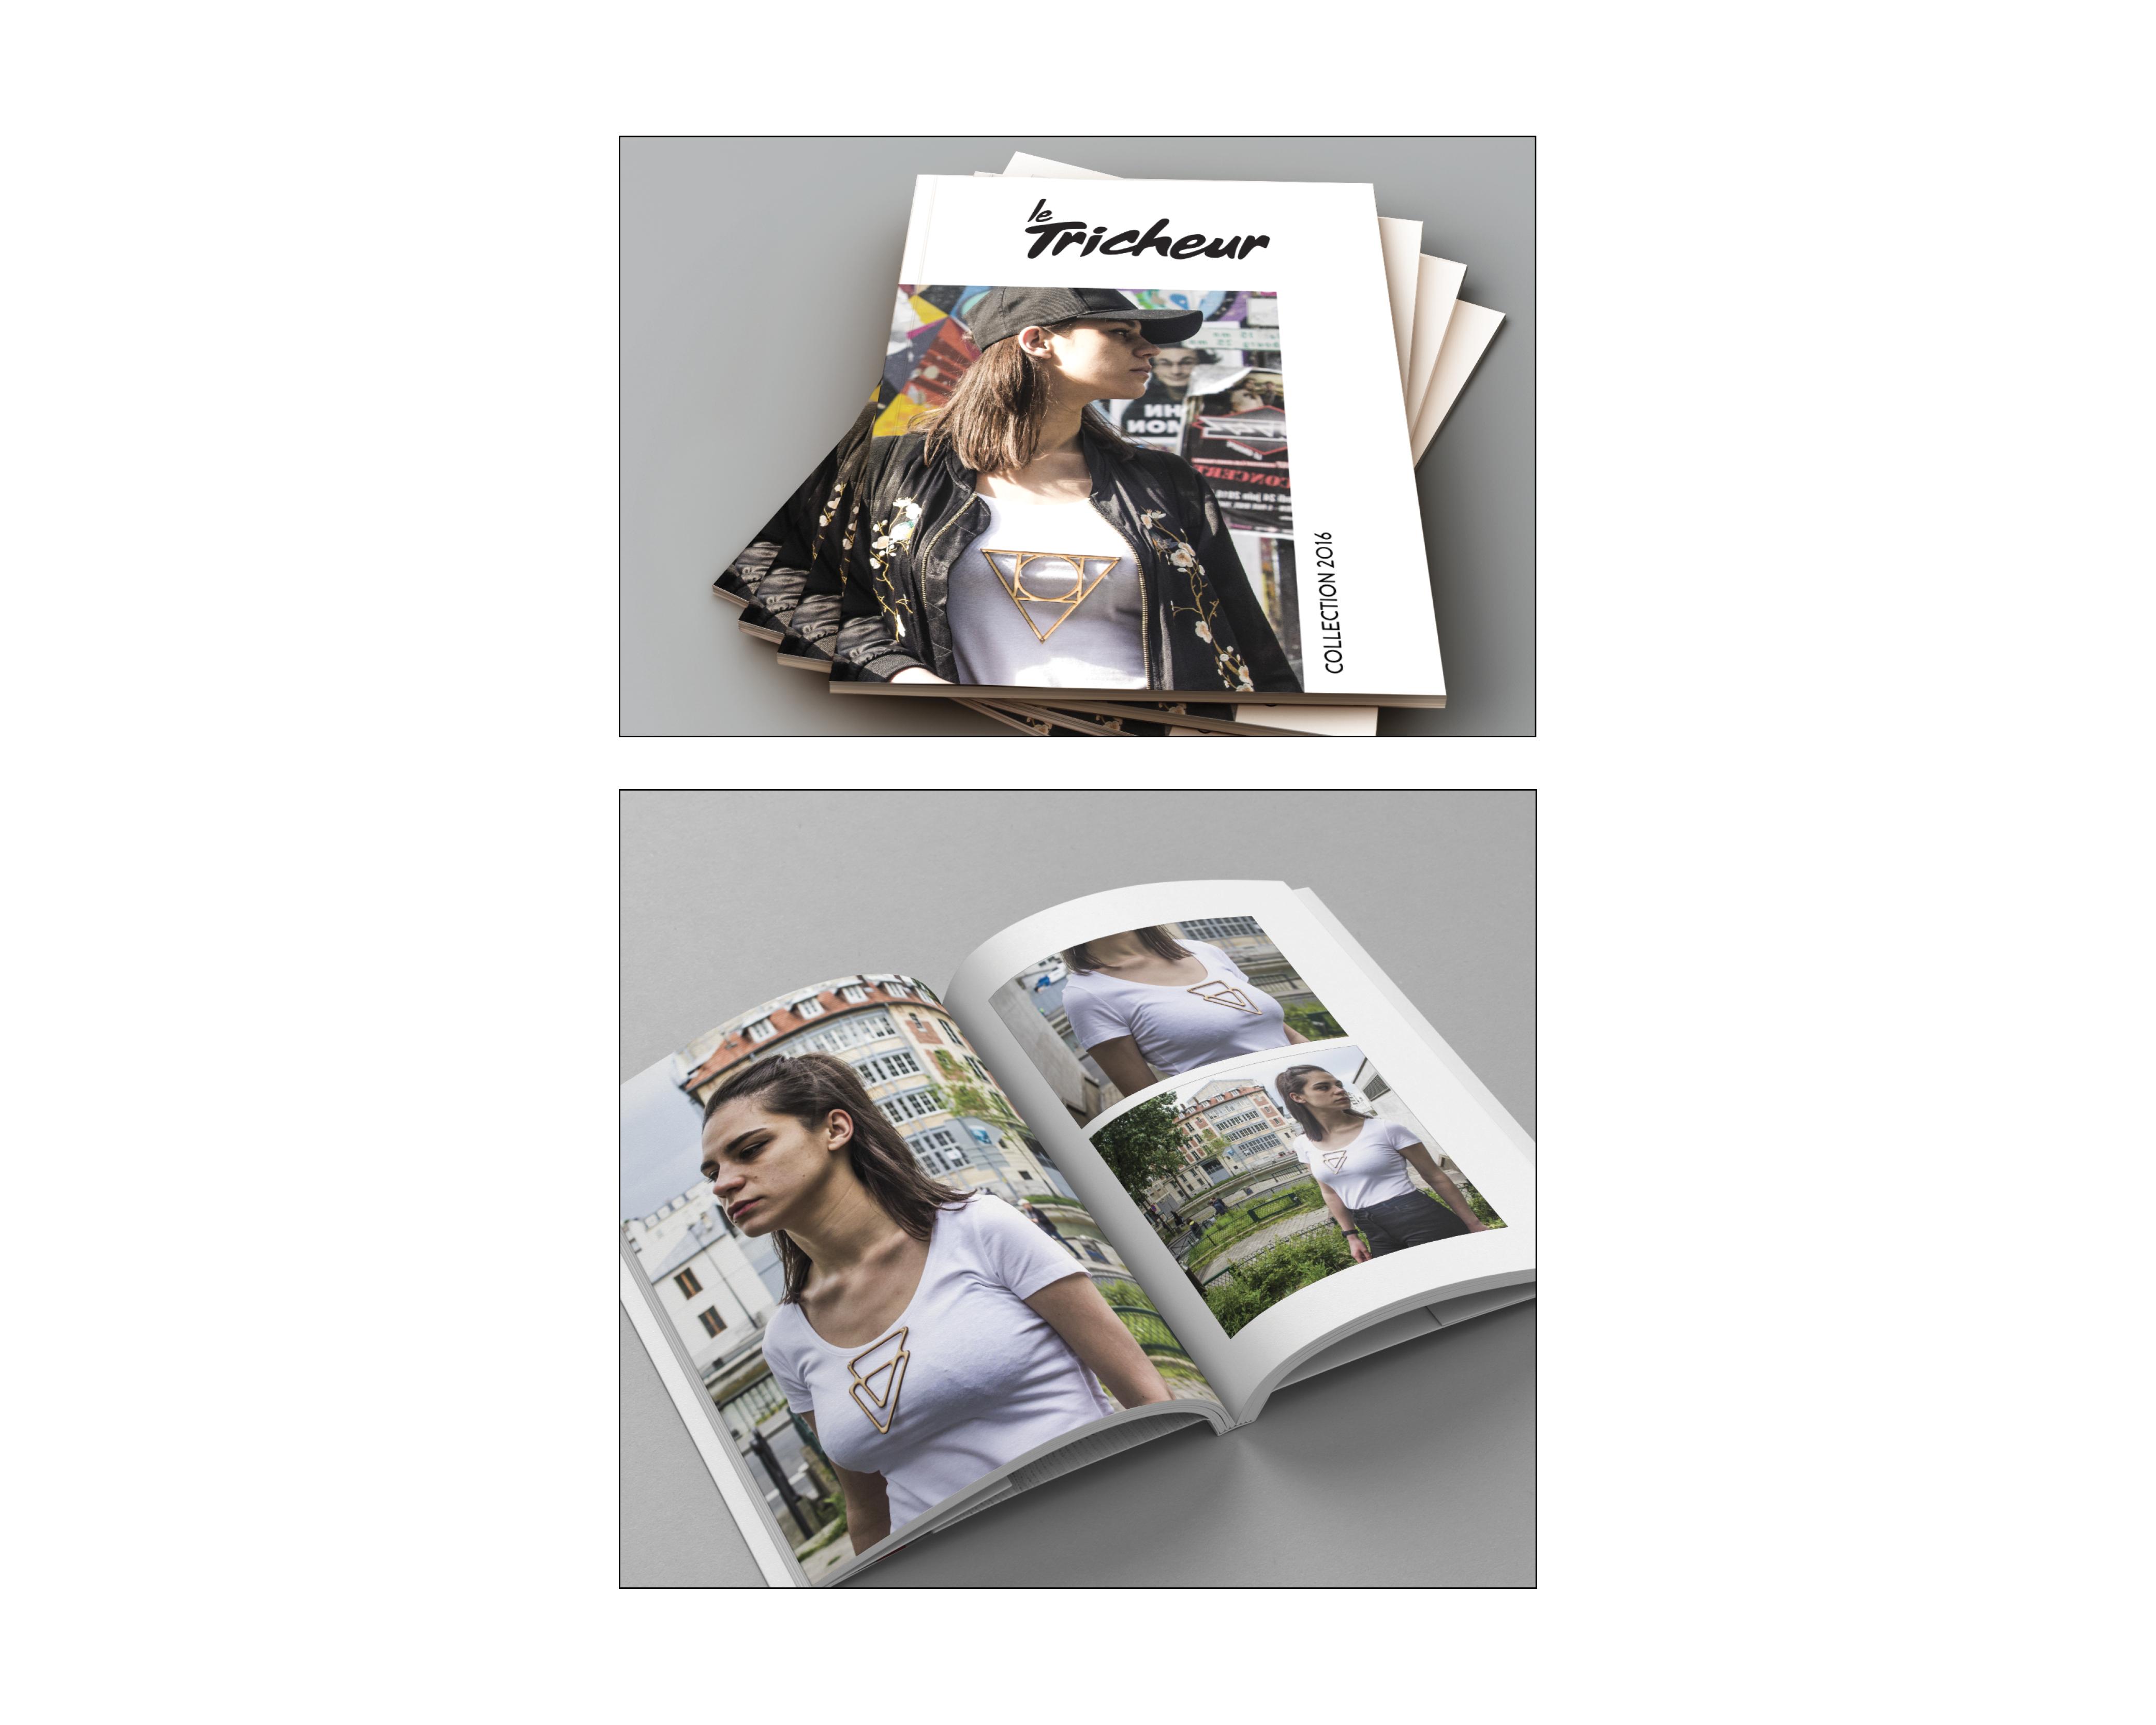 LetortCharlotte-LetricheurLookBook